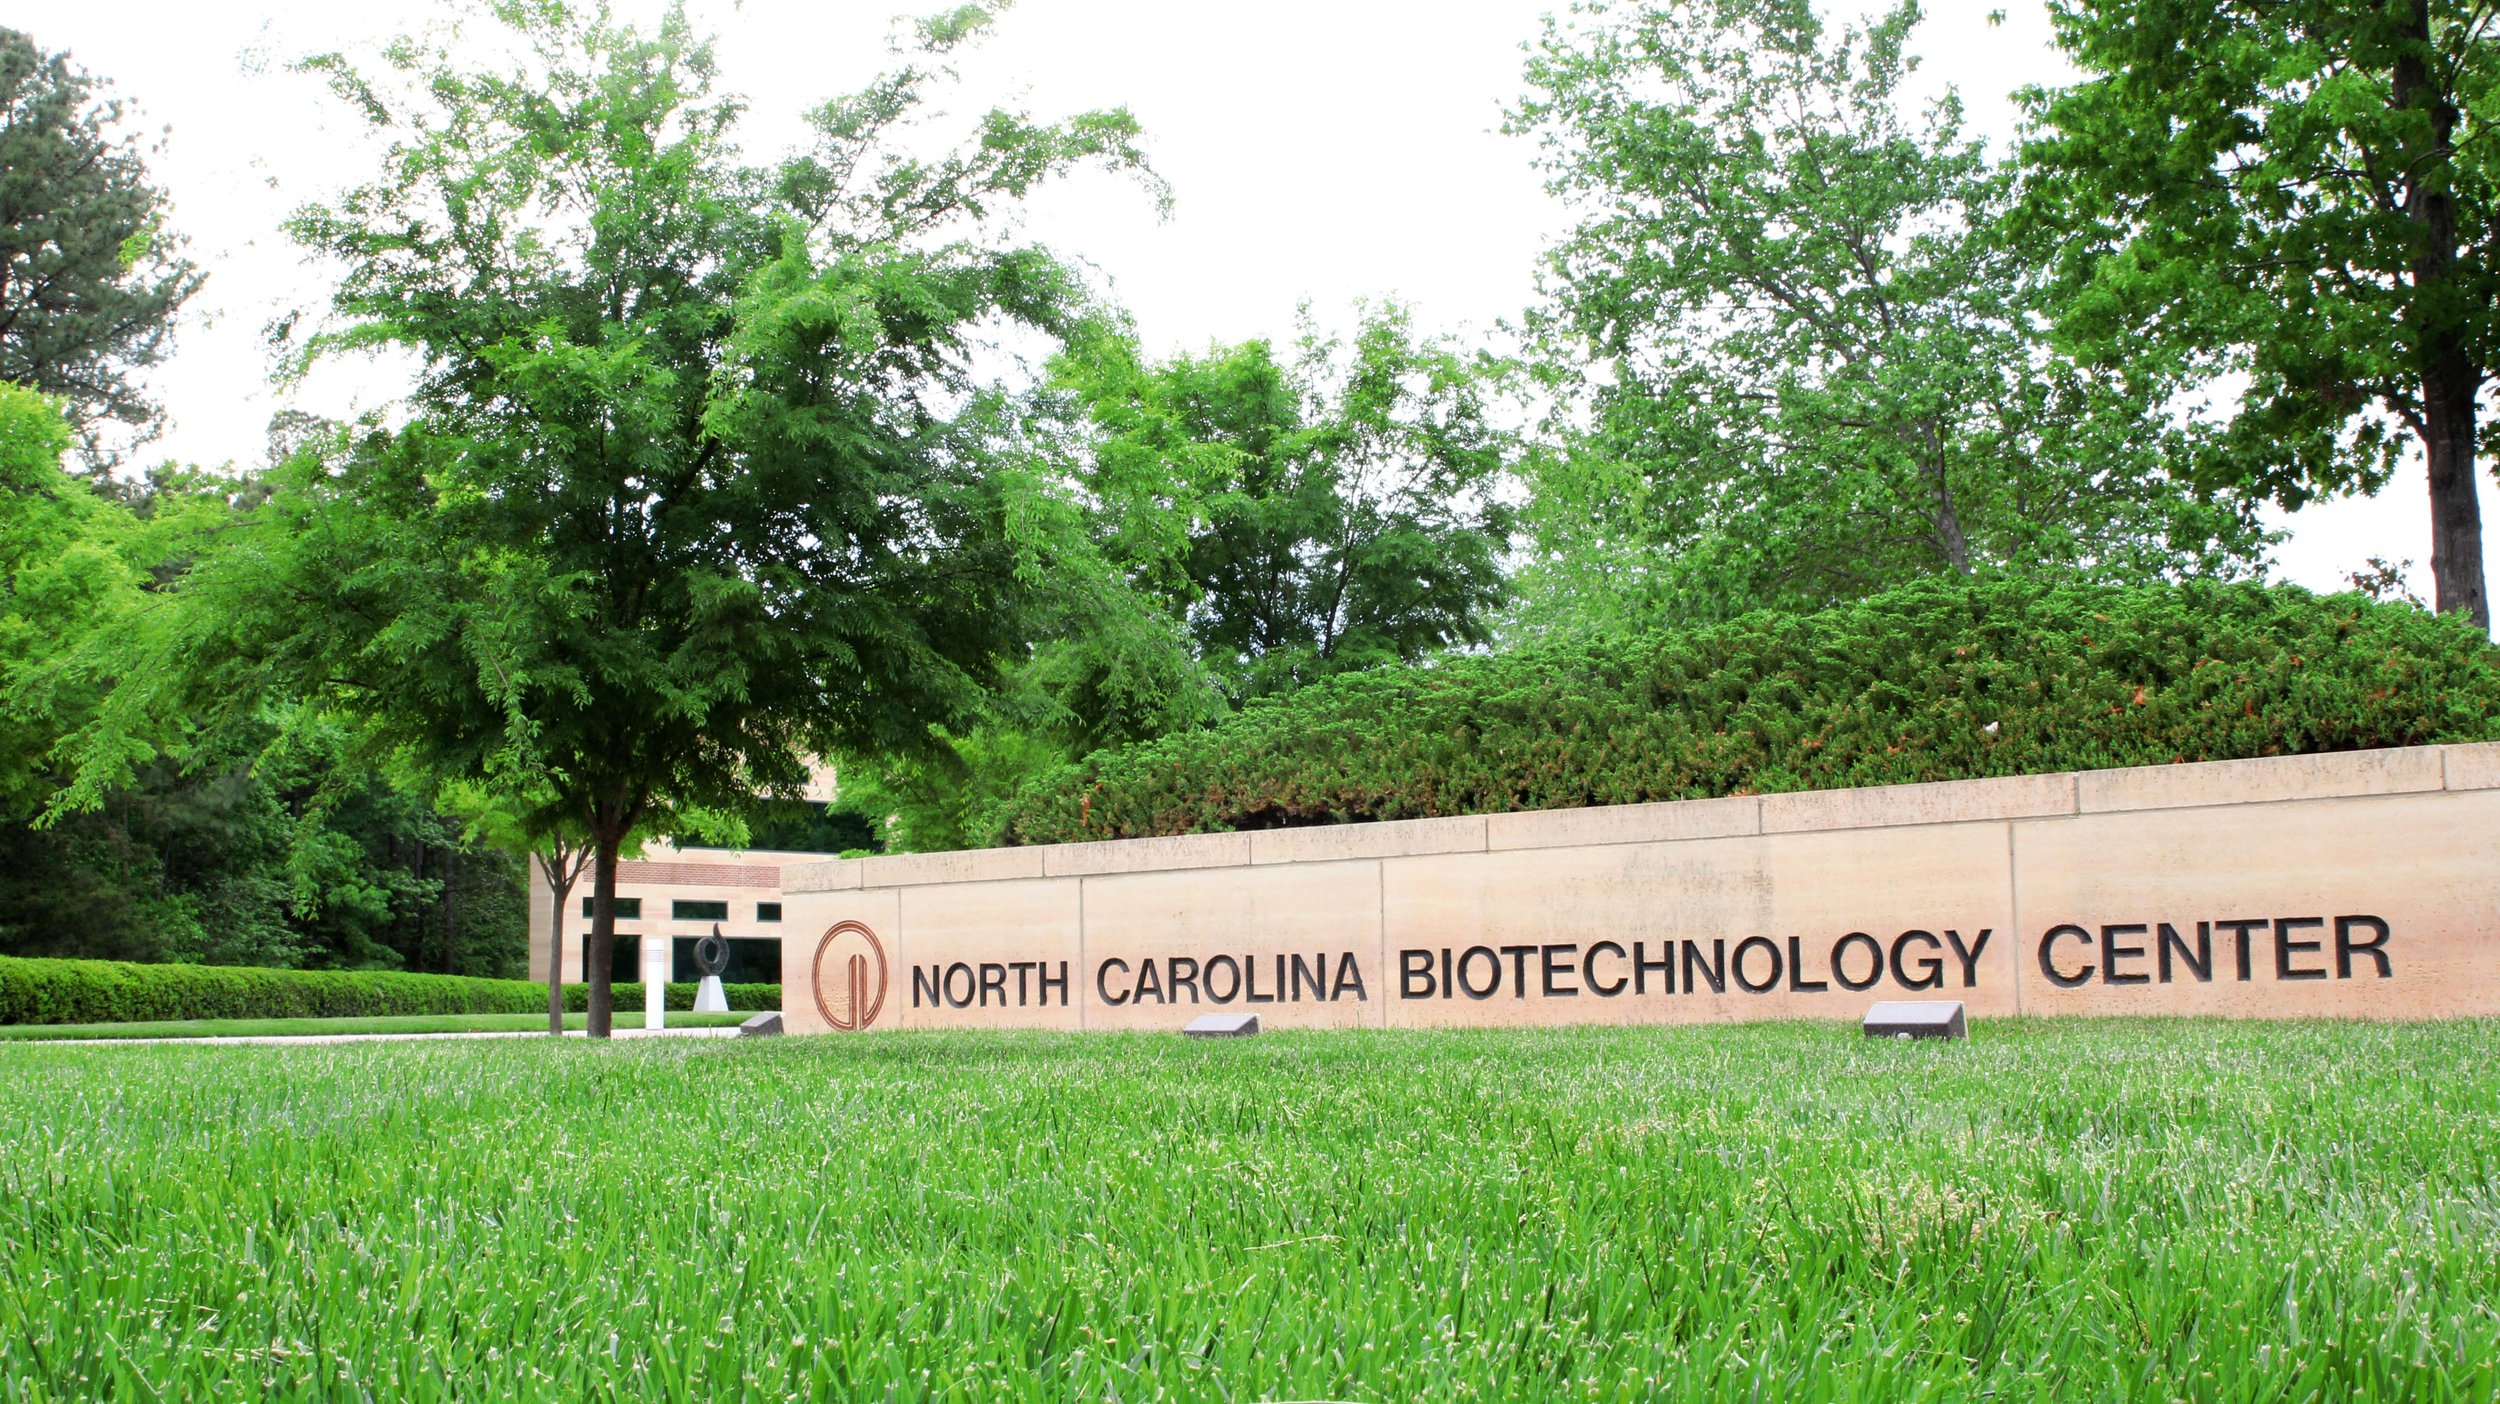 BioTech Center Sign.jpg